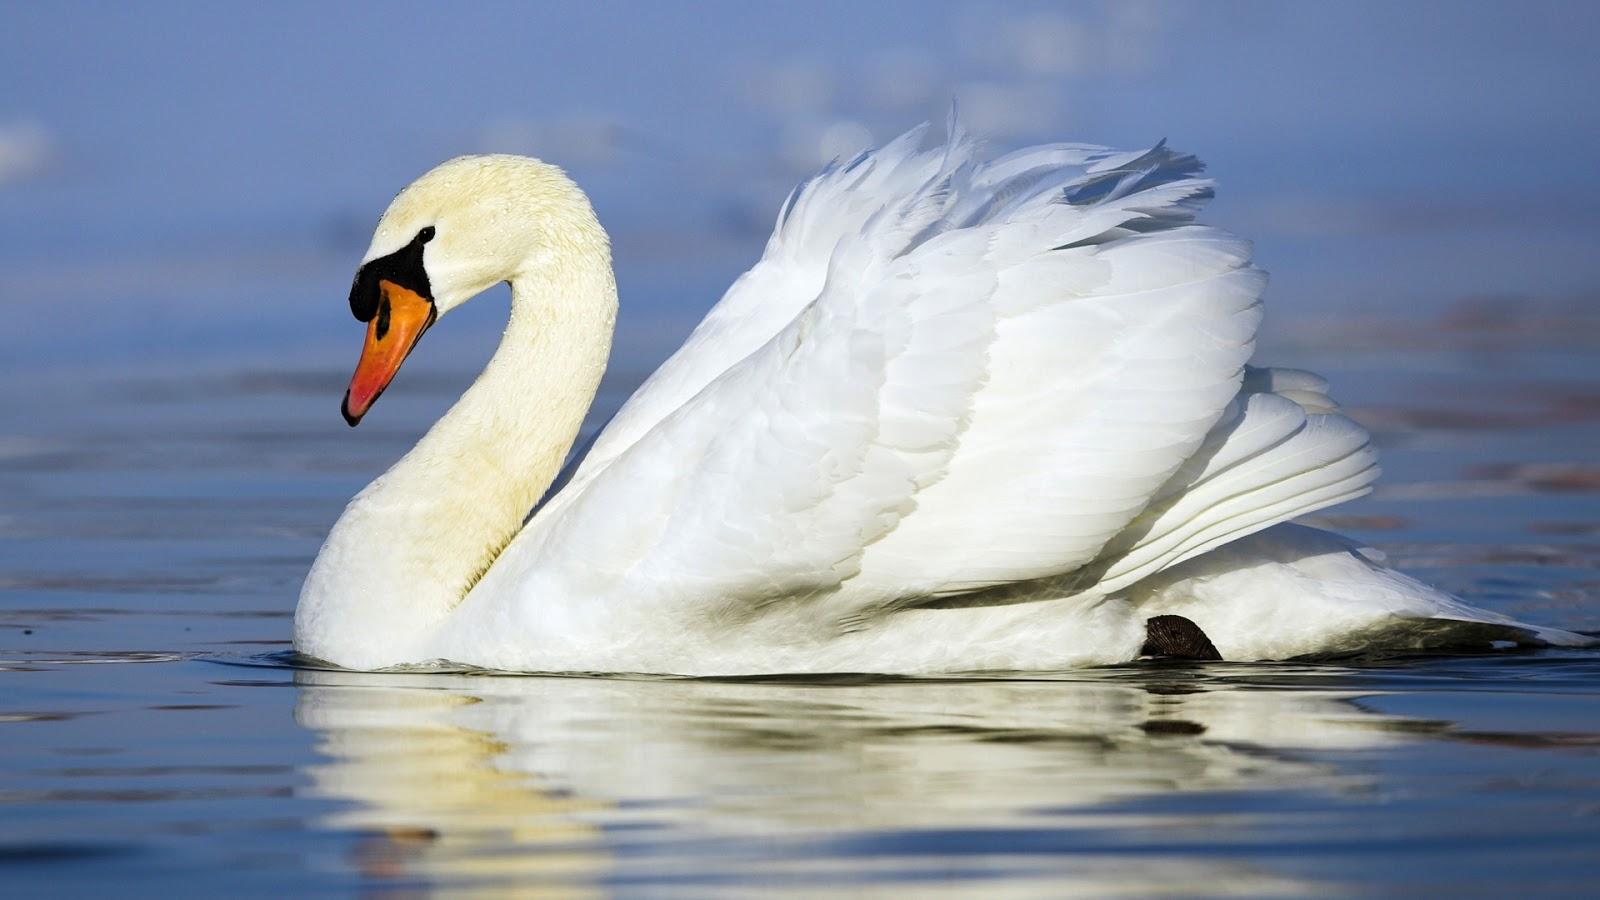 Hd Animal Wallpapers High Resolution Animals Download: Animal Hd Wallpapers,high Resolution Pics Of Animal Pics